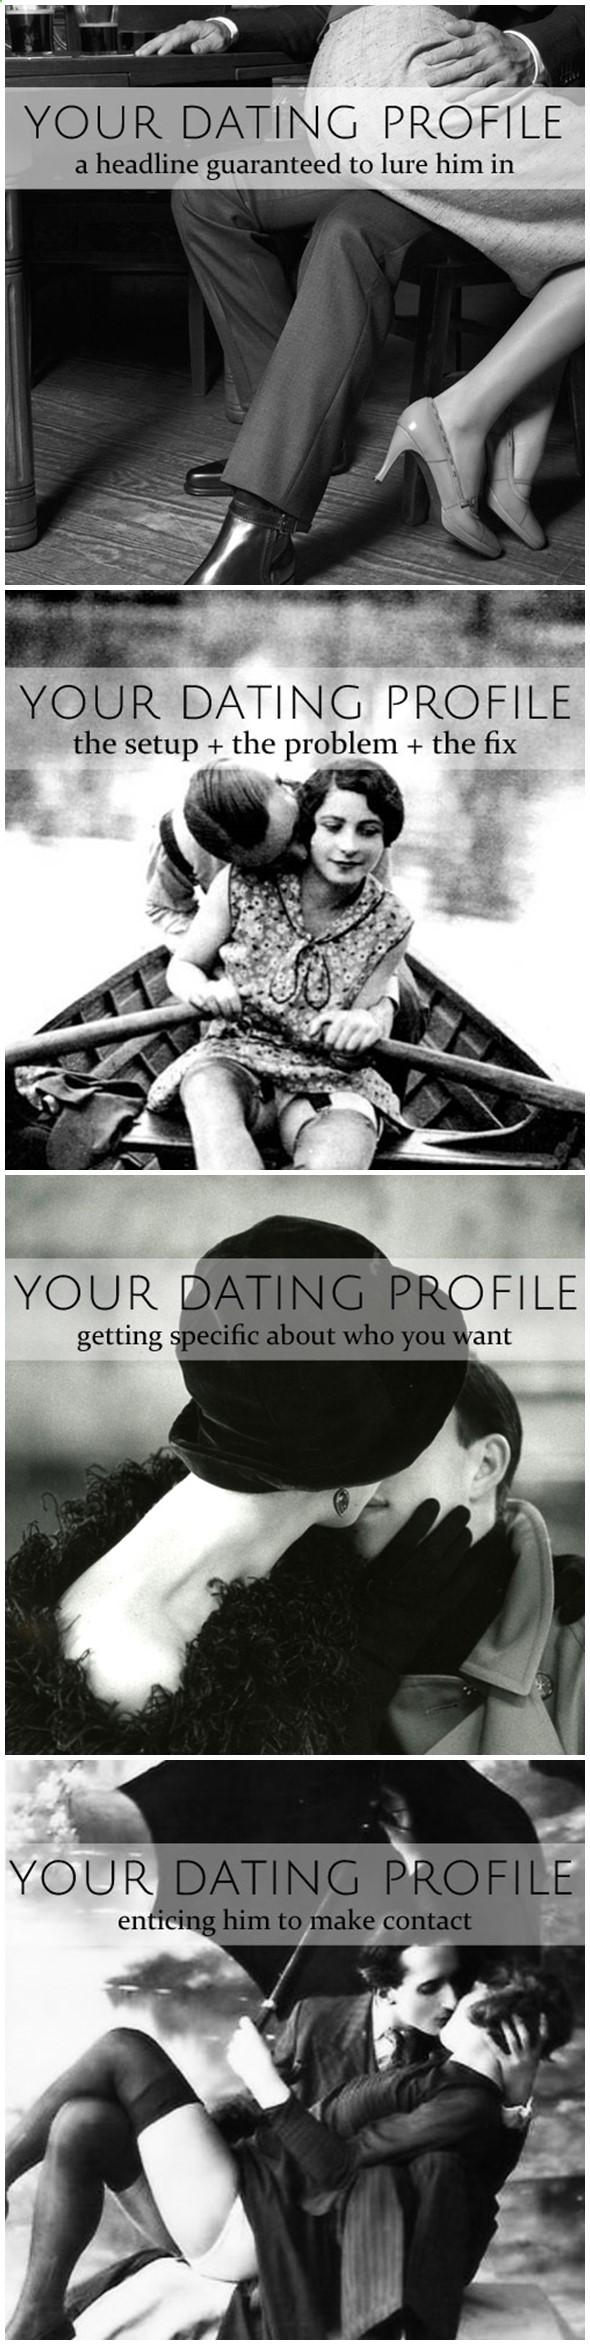 Poster headline ideas for dating